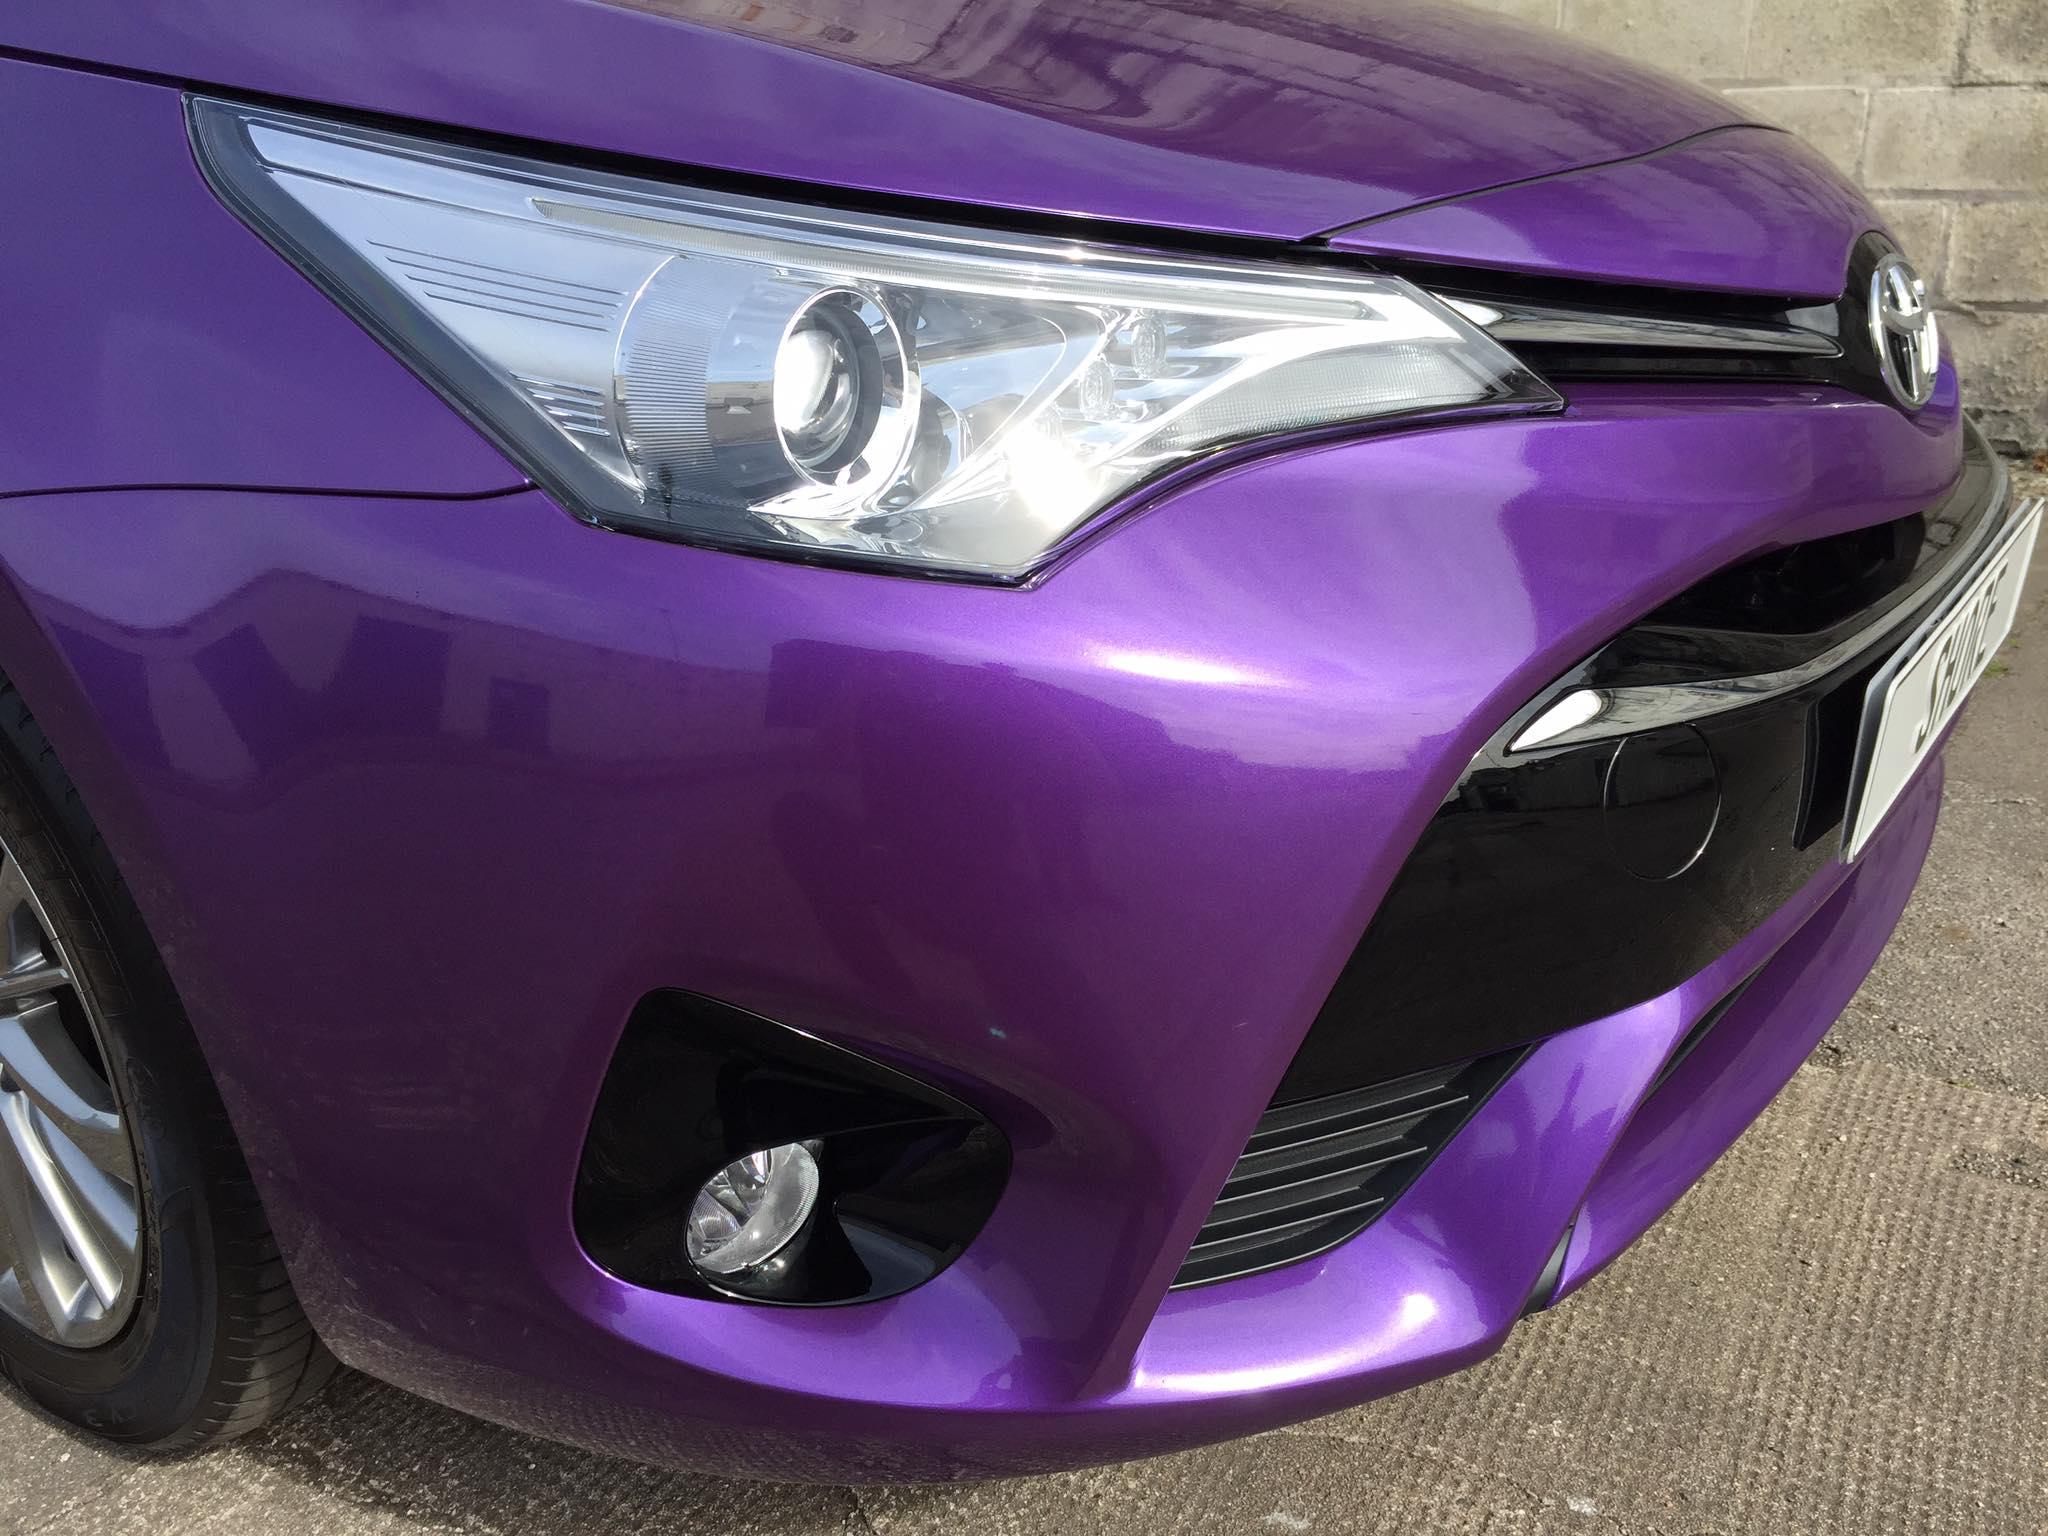 Toyota Avensis Purple wrap corner